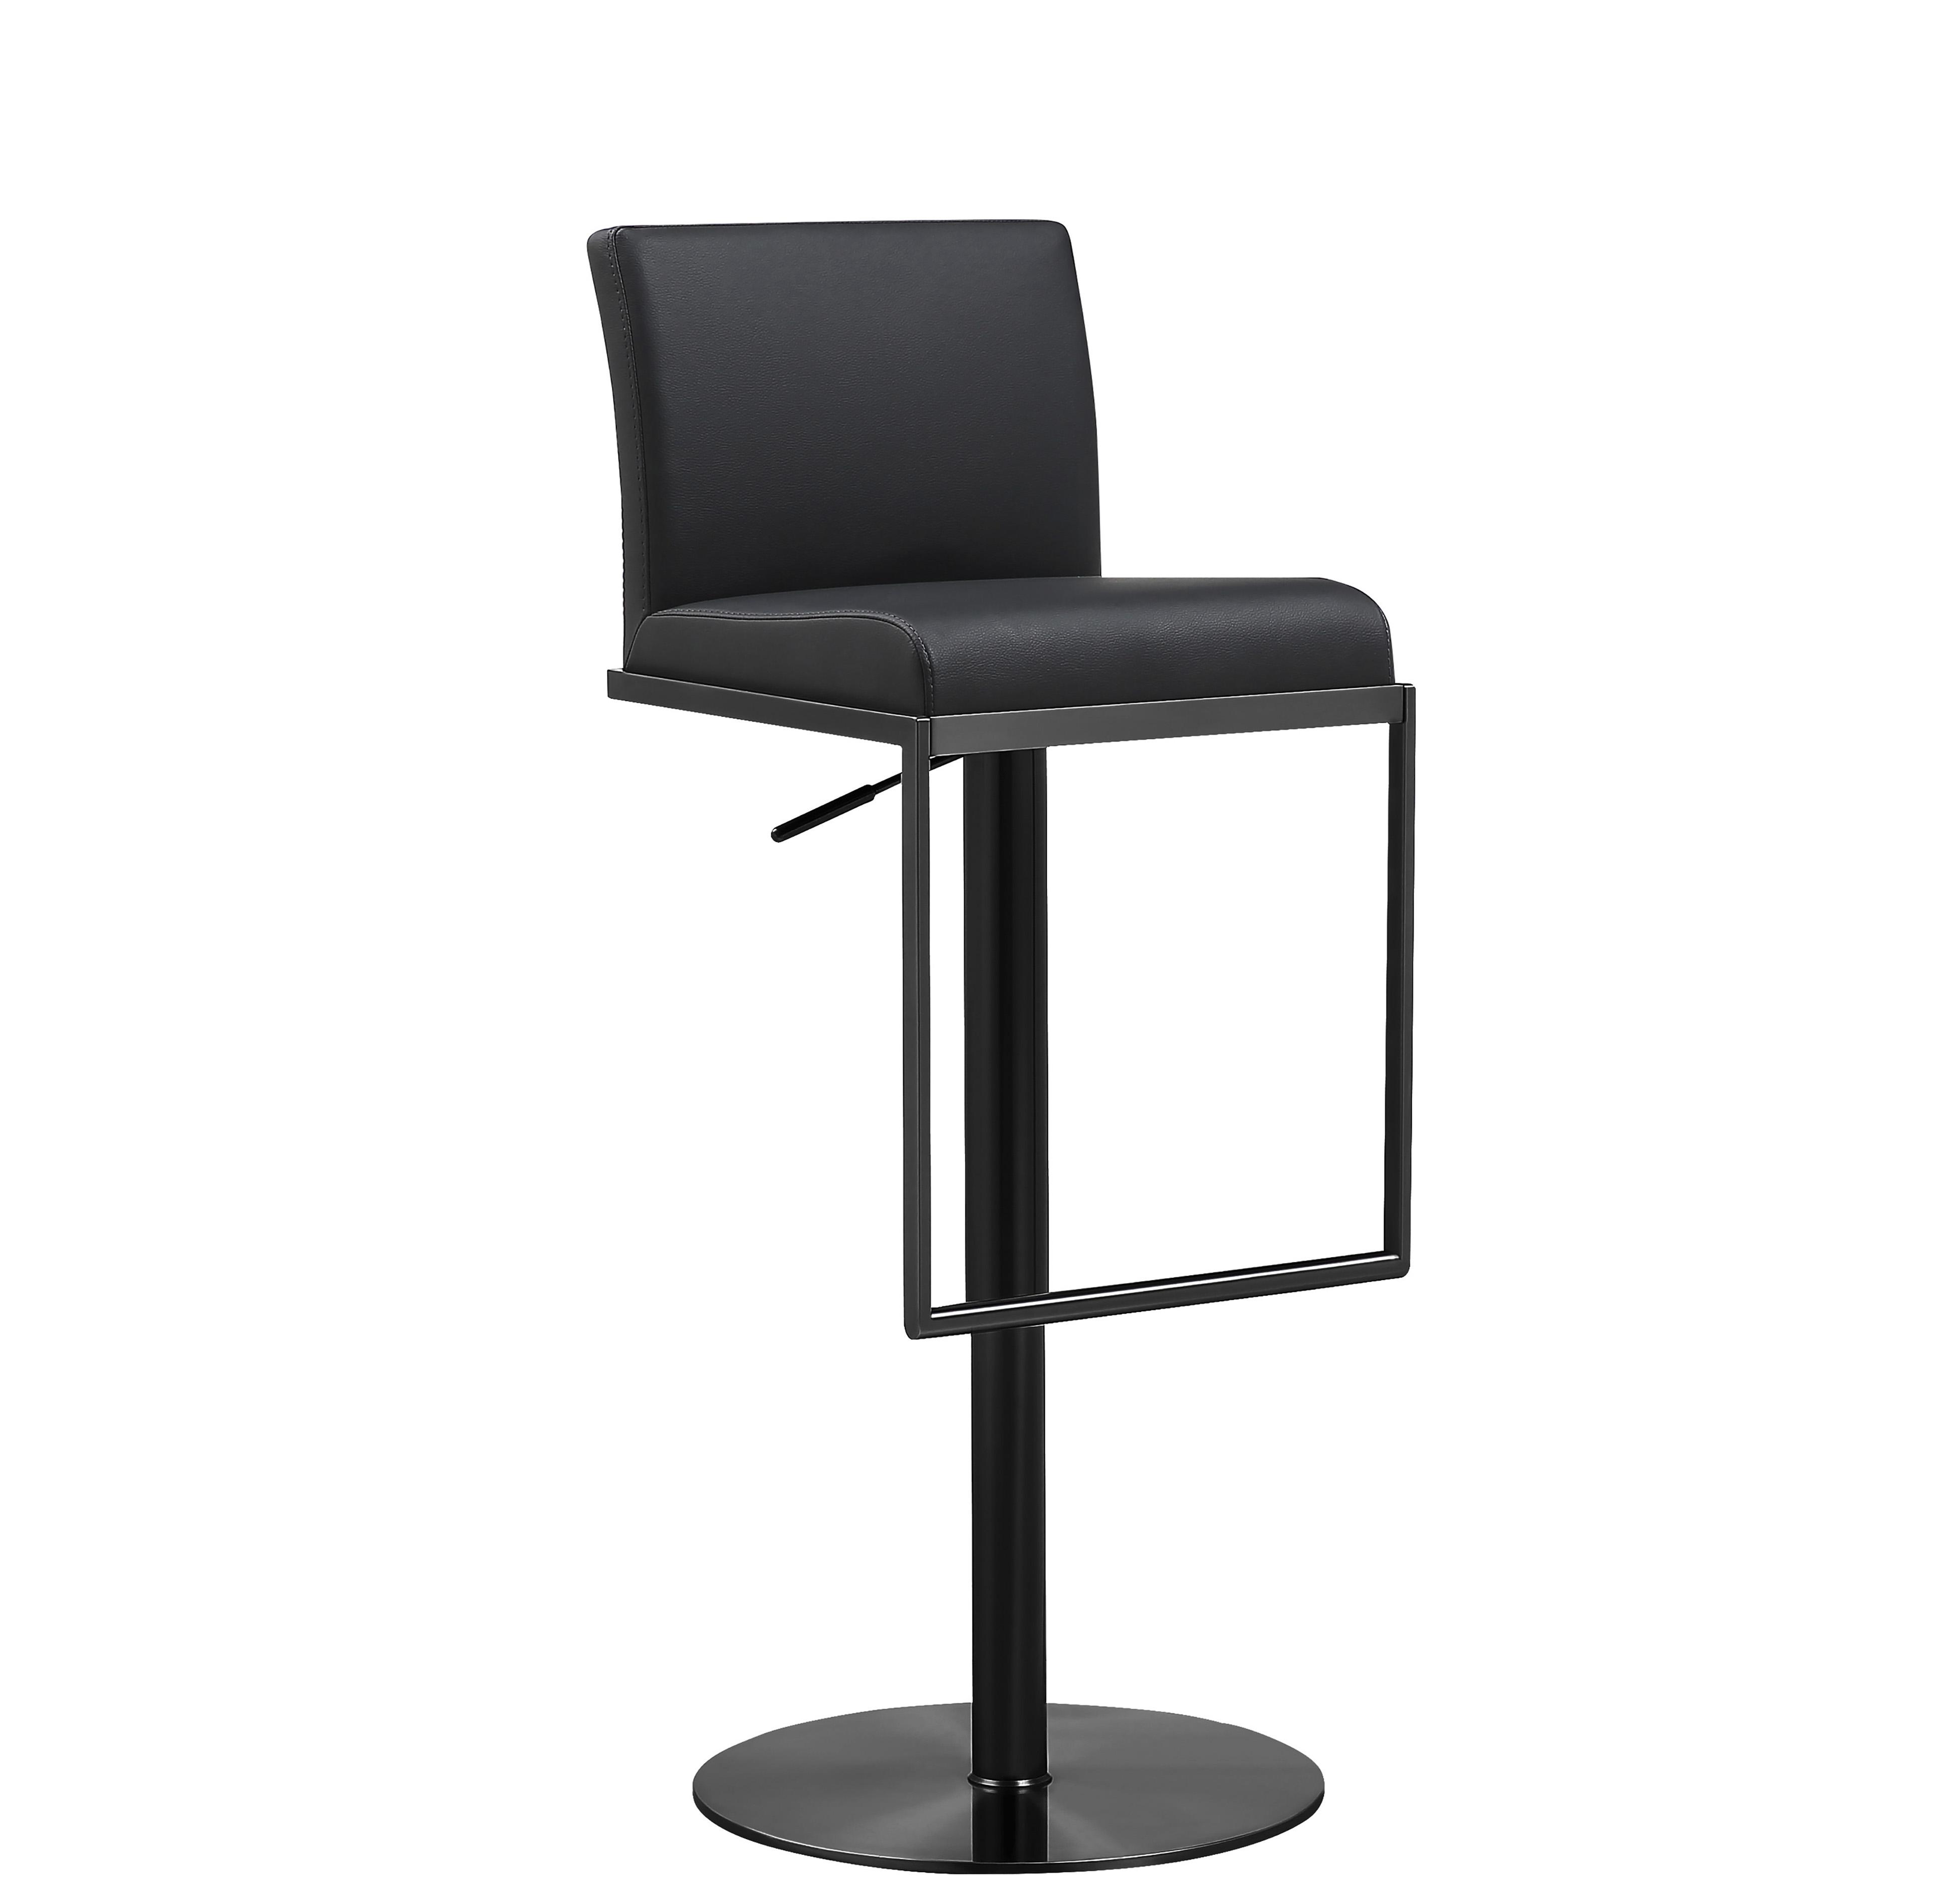 Amalfi可調式吧台椅